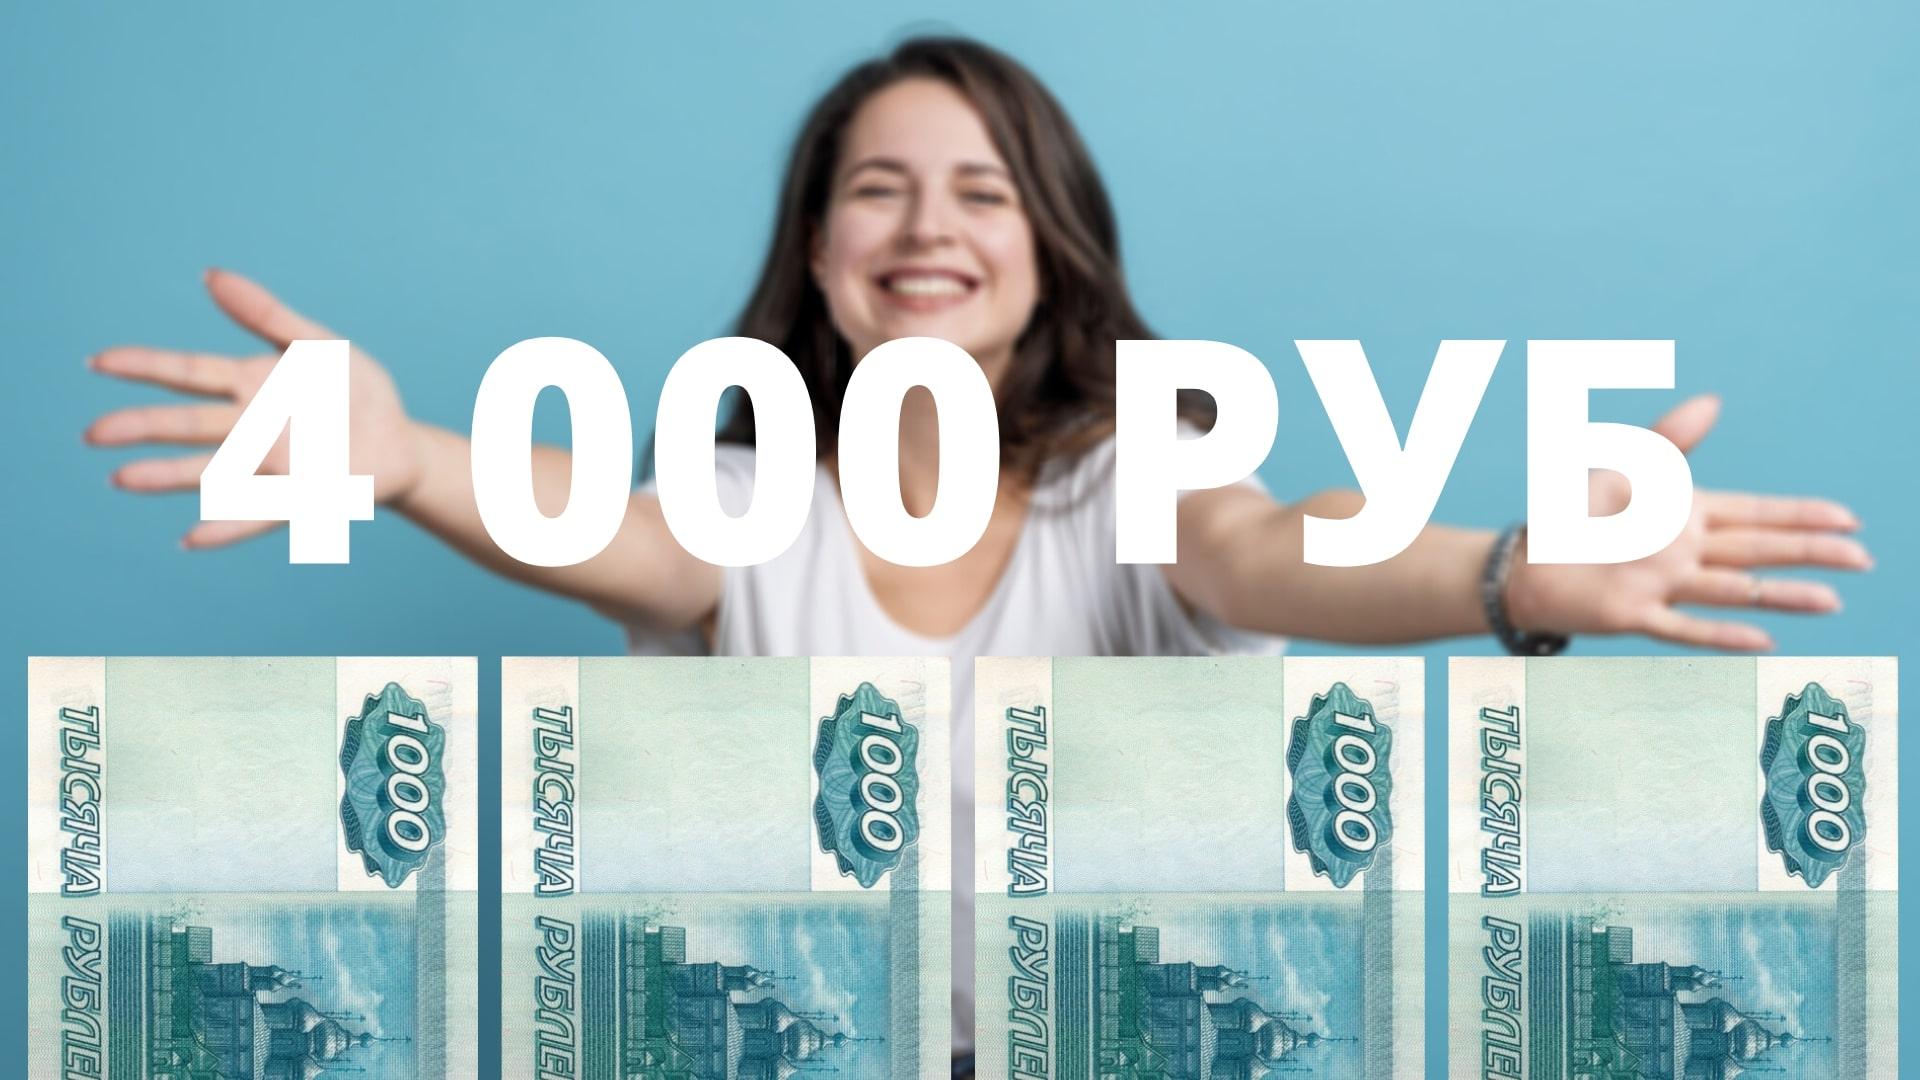 кэшбэк за оплату жкх 4 тысячи рублей